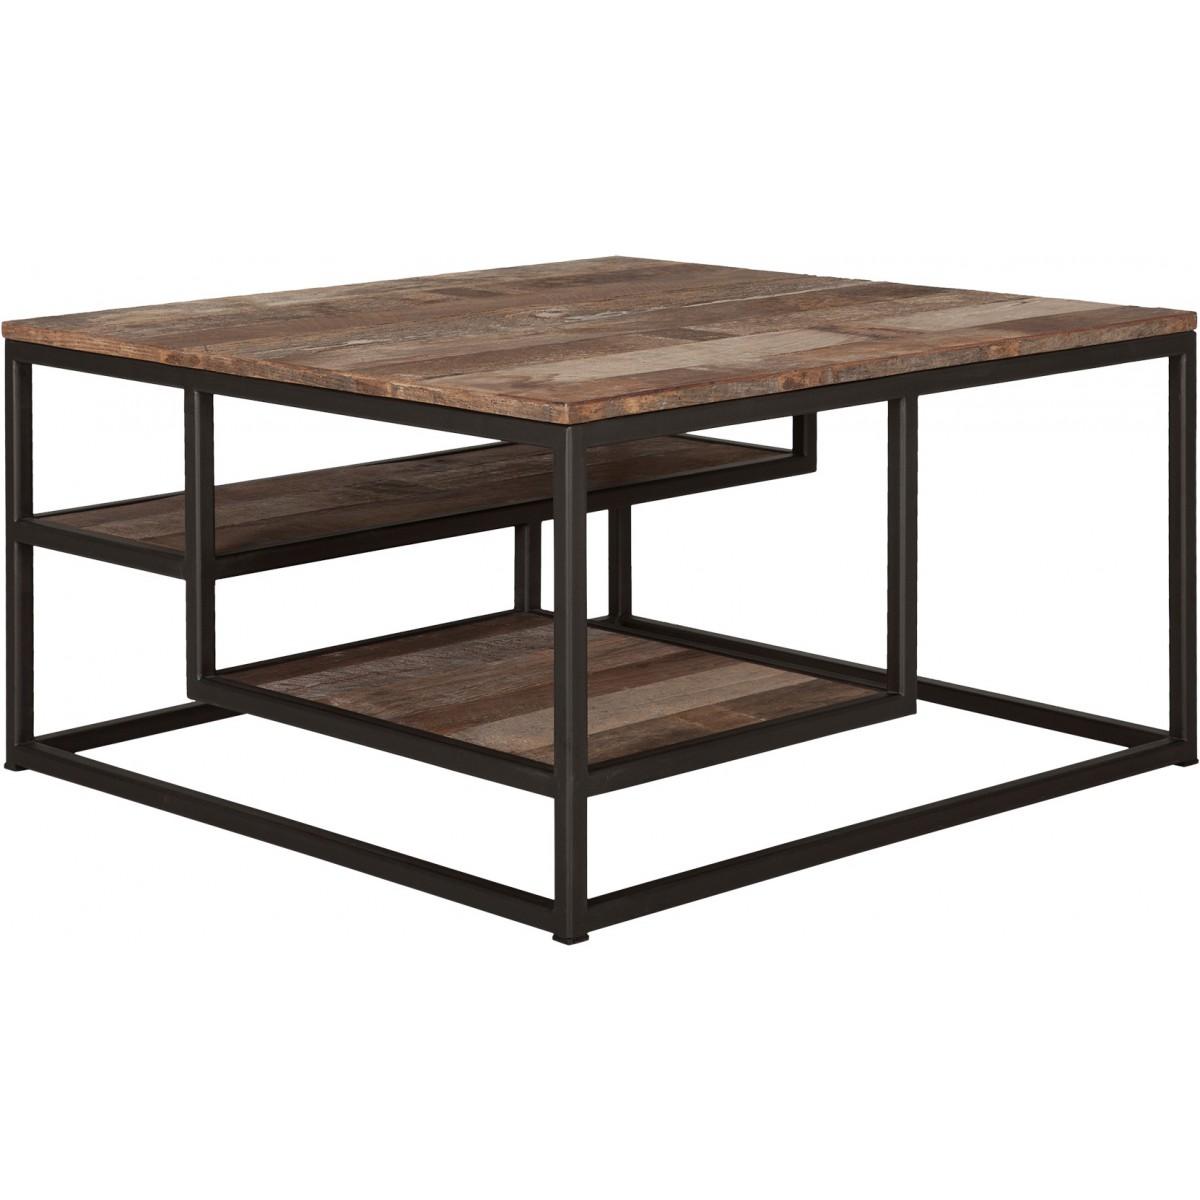 tuareg-salontafel-vierkant-40x75x75-cm-miltonhouse2